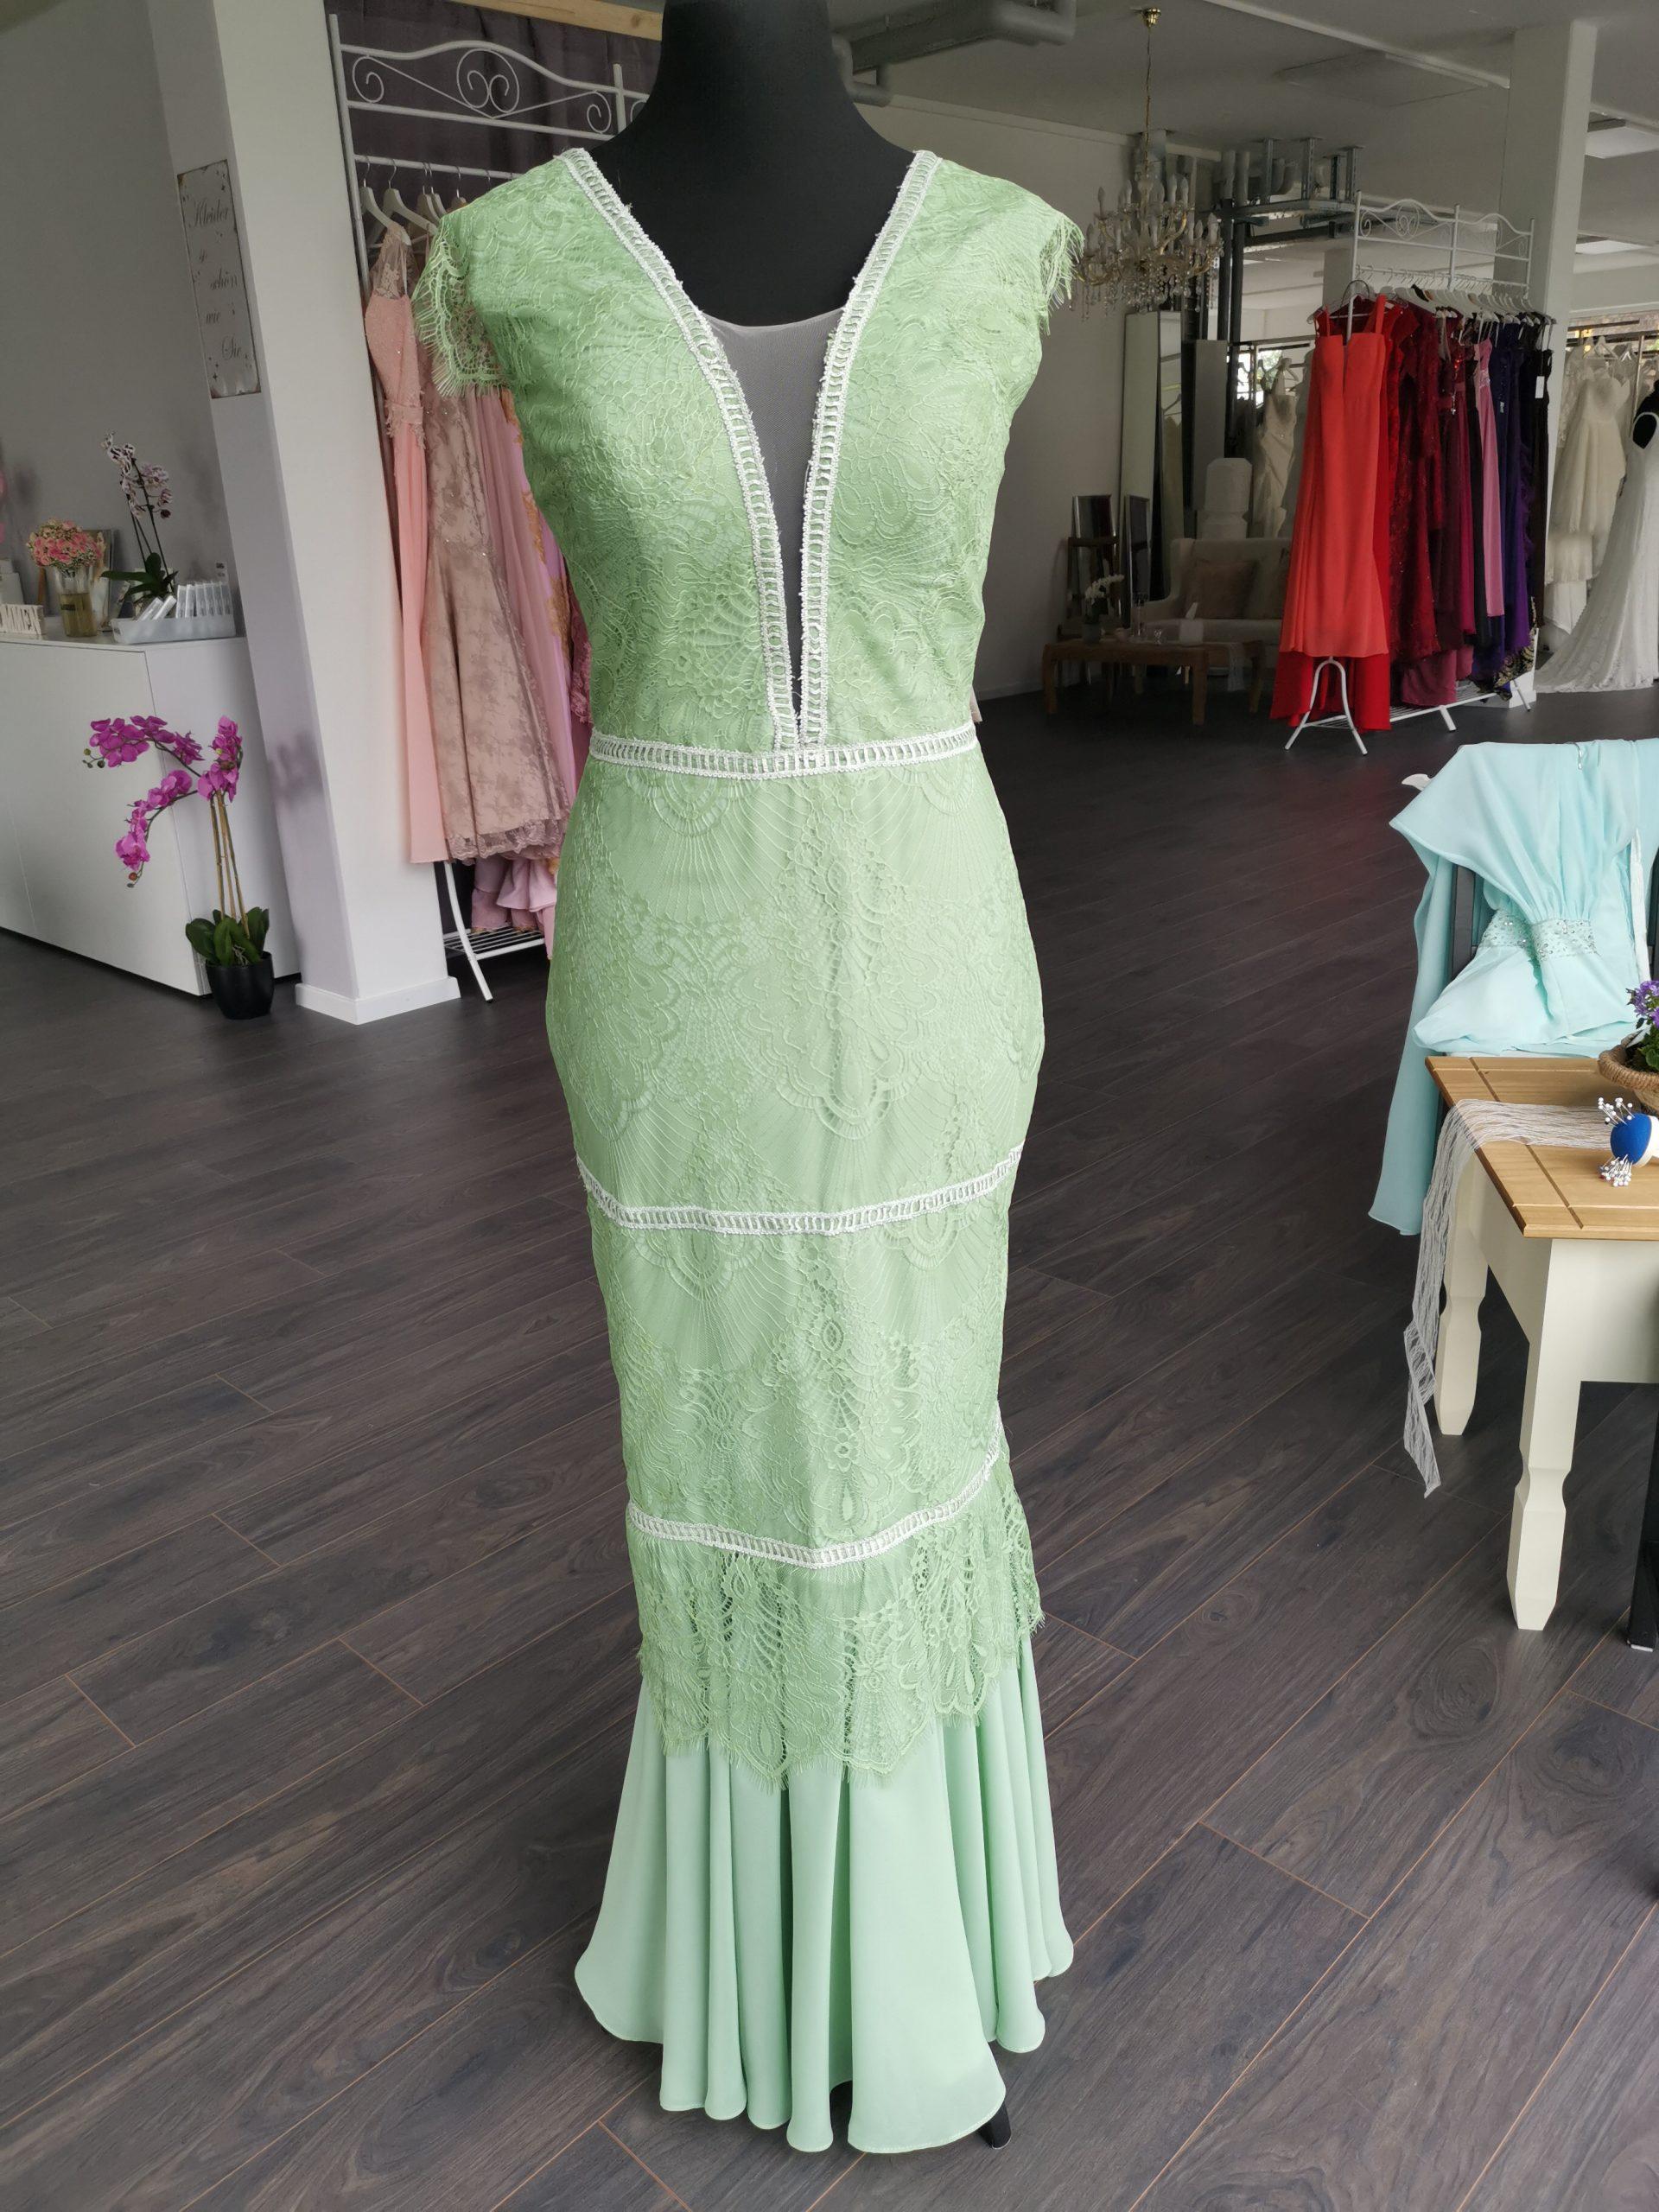 15 Genial Abendkleid Xara StylishFormal Luxus Abendkleid Xara Spezialgebiet